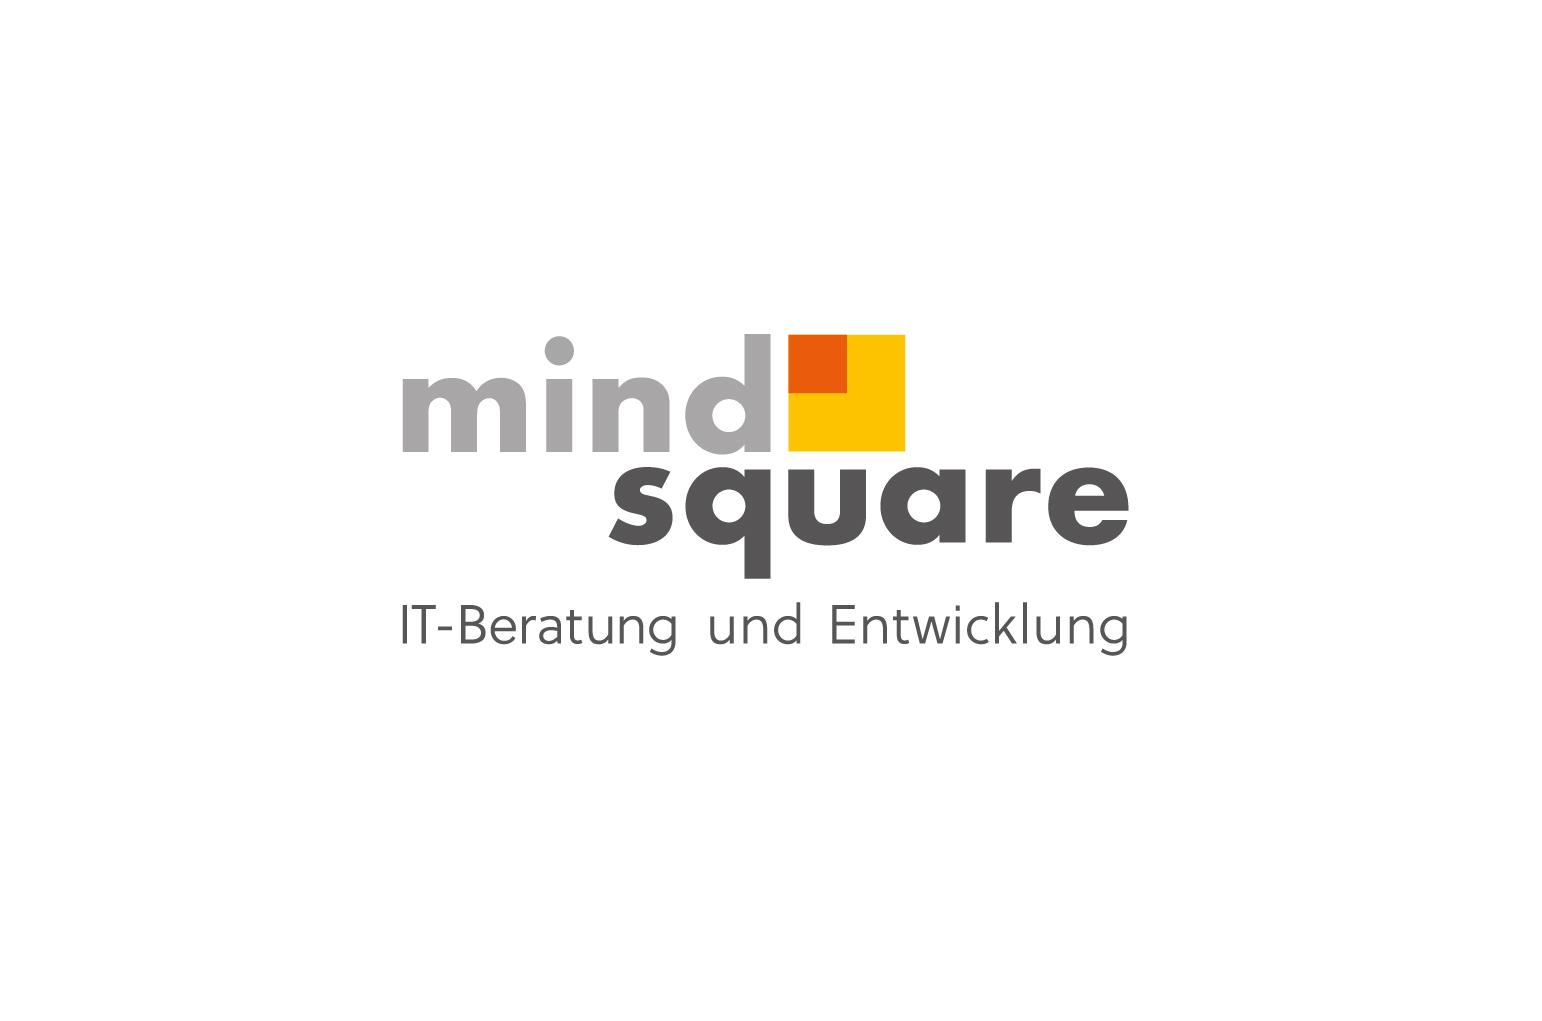 mindsquare